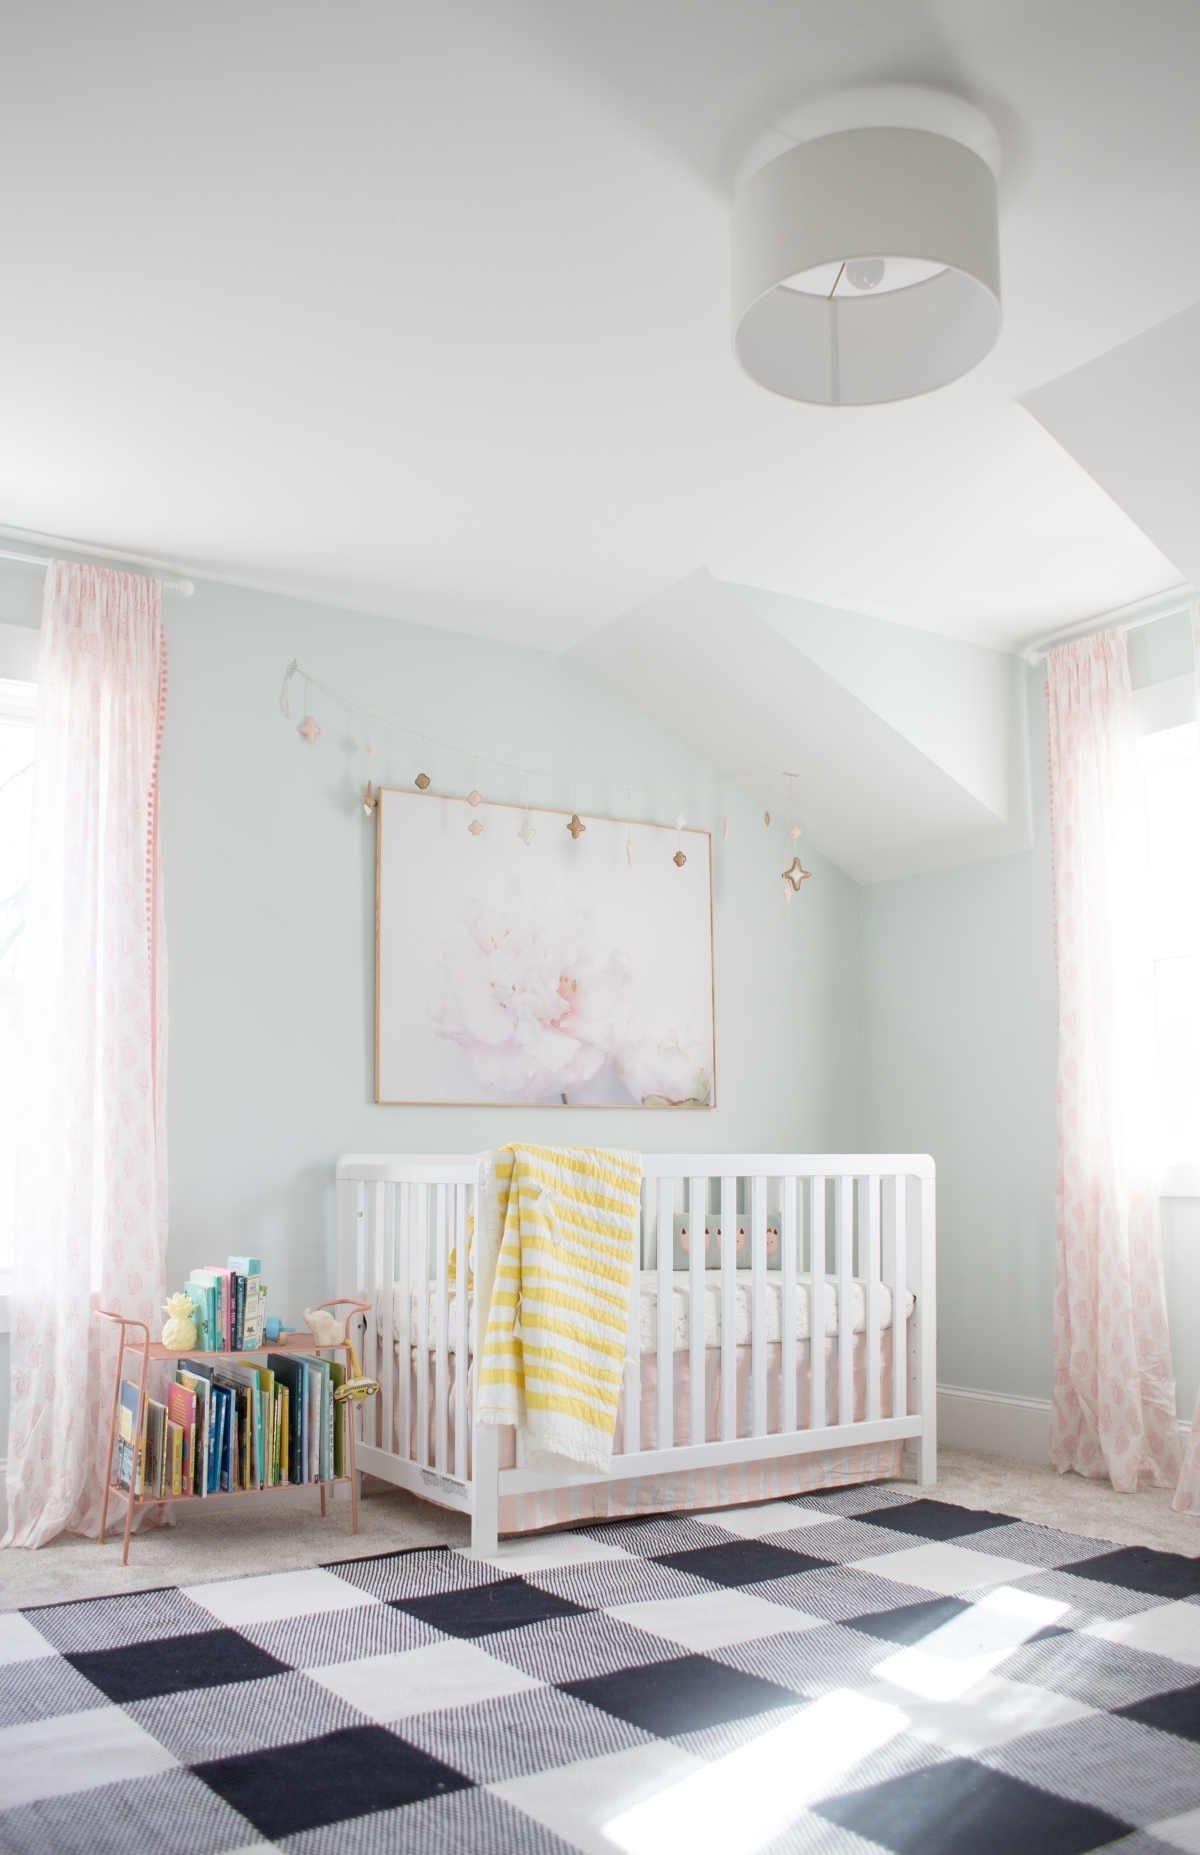 10 Trendy Nursery Ideas On A Budget neutral nursery ideas on a budget lay baby lay